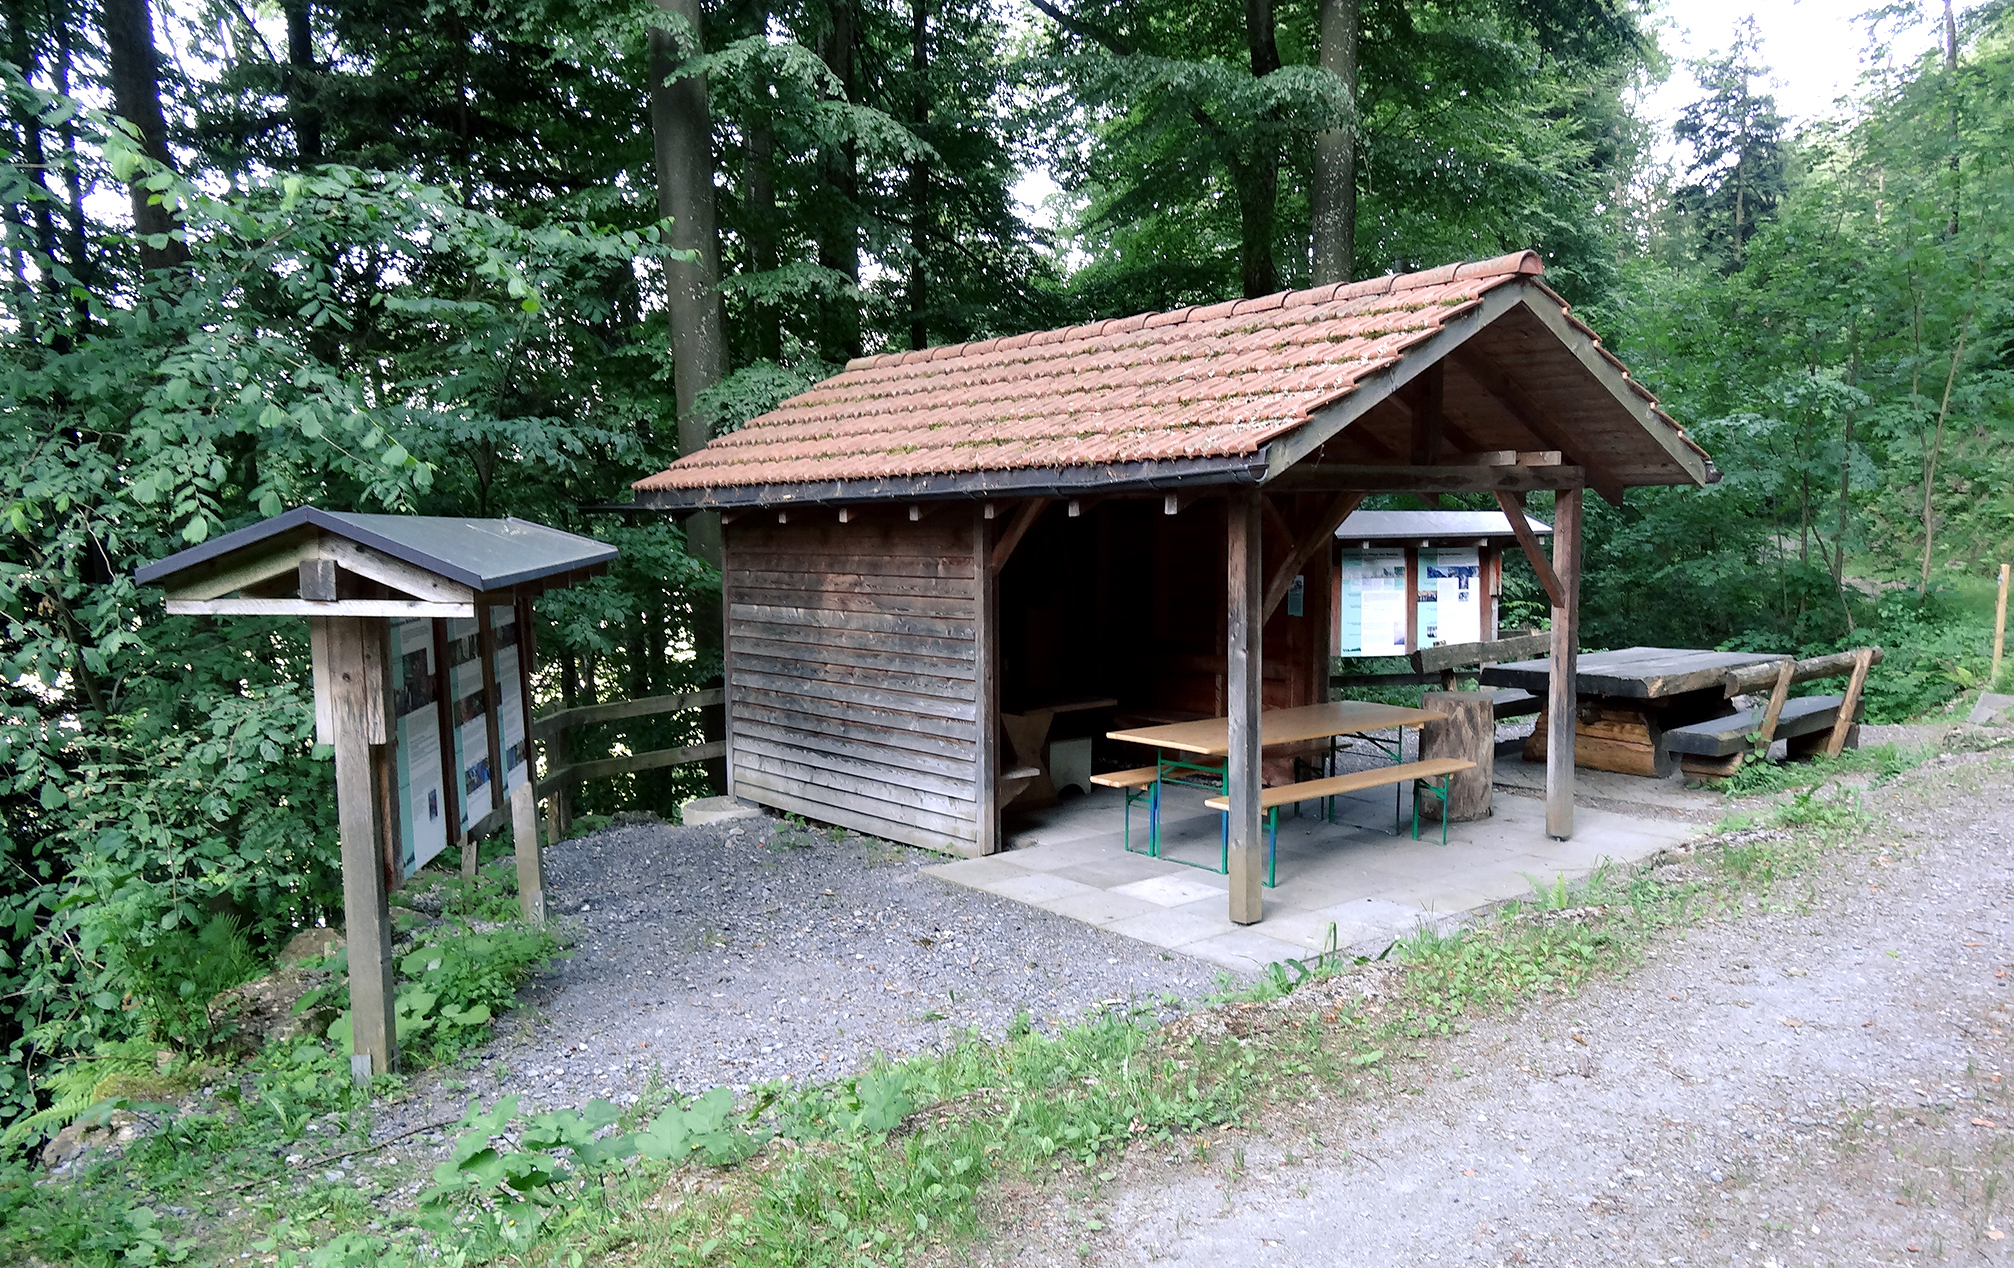 Via Silva Waldlehrpfad Hütte